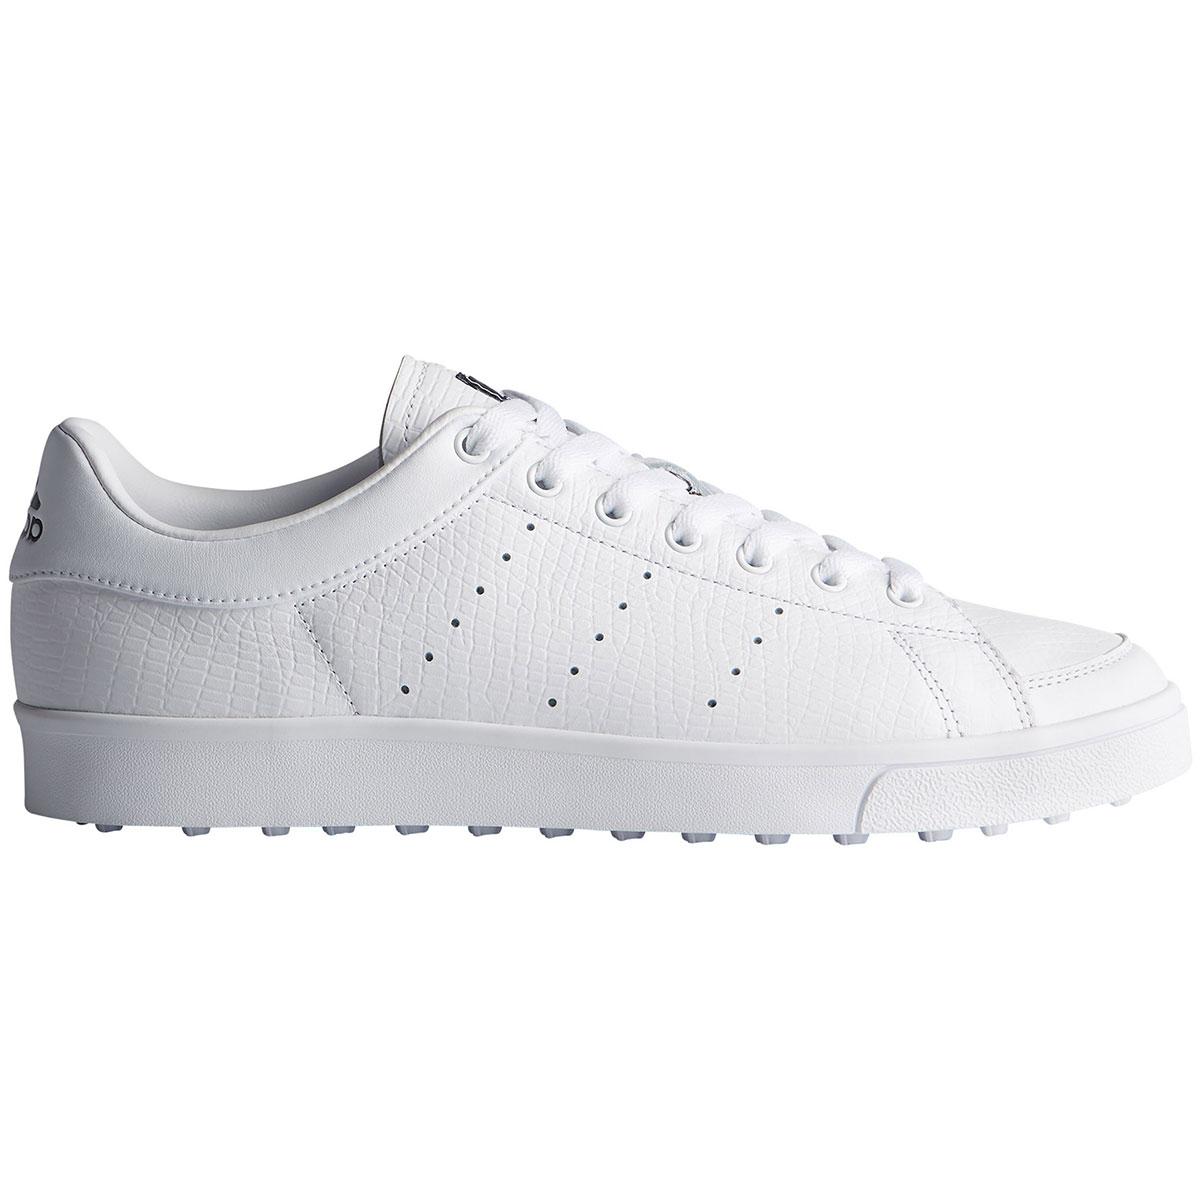 huge discount 6ef67 ed5ef Adidas Adicross Classic LthrS8 ...